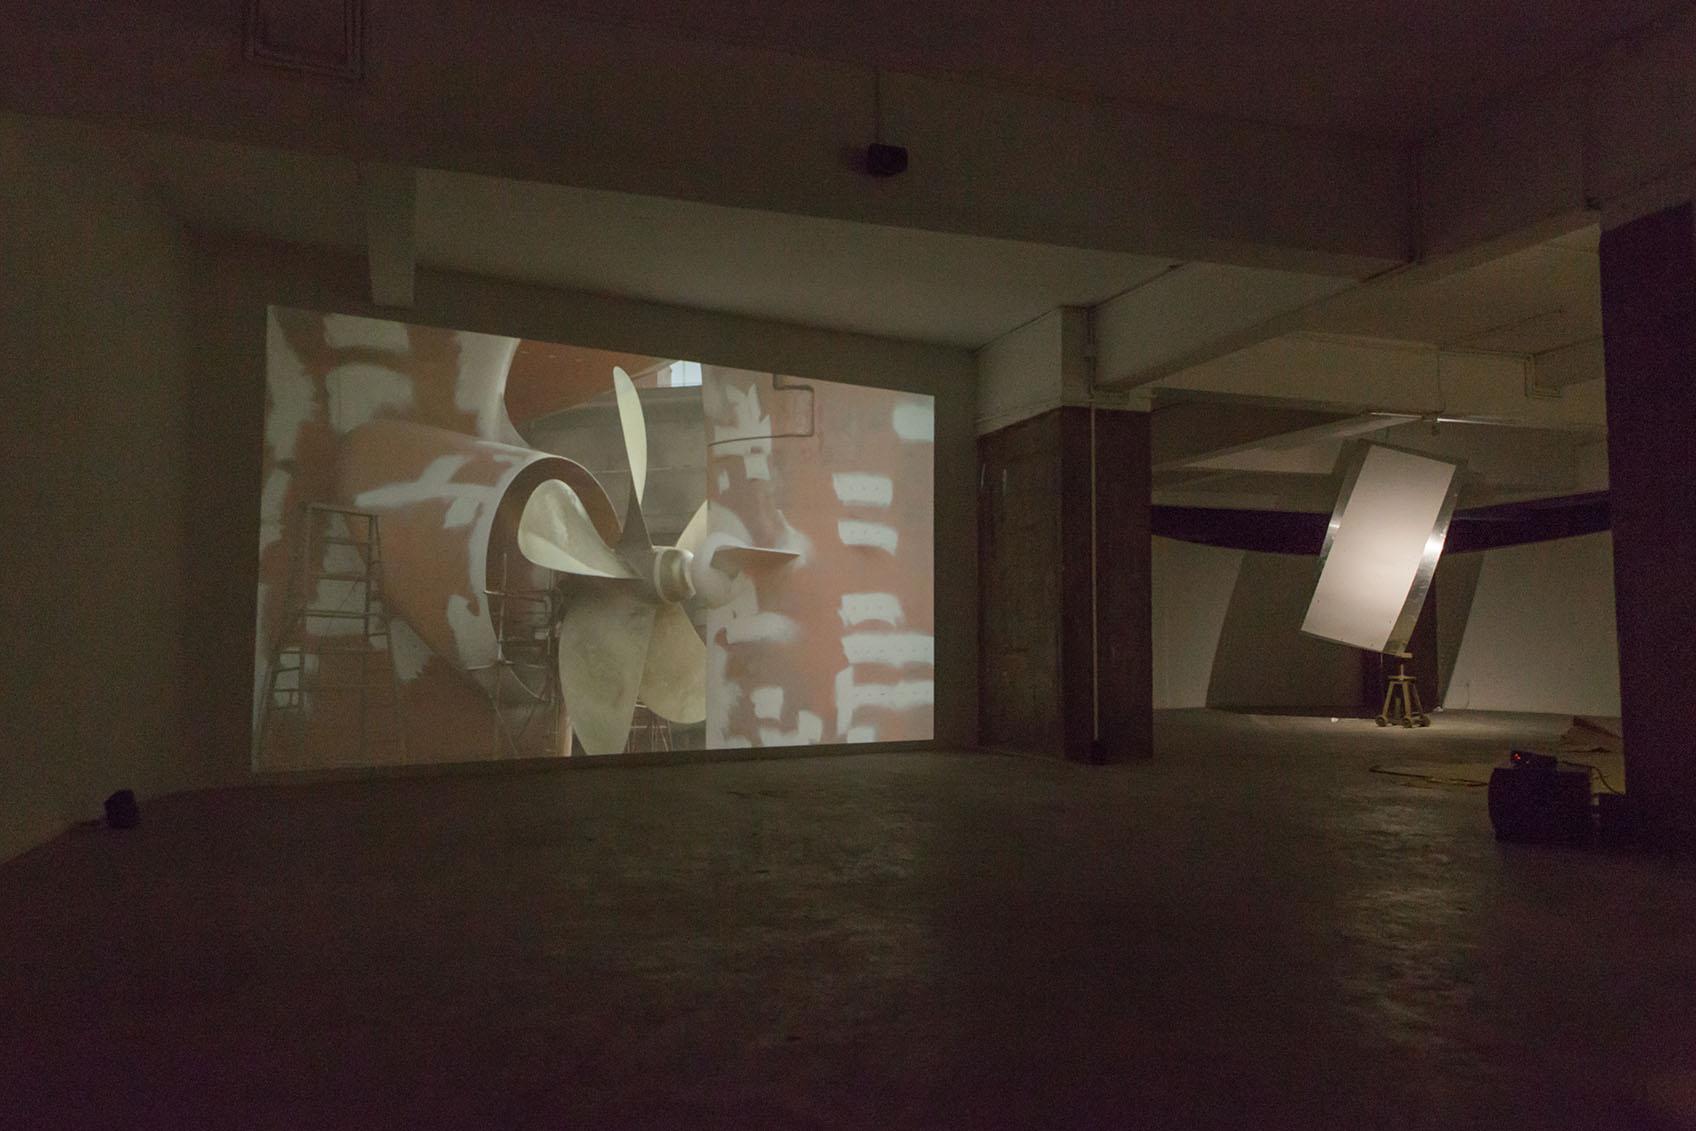 x04-展览现场 exhibition view